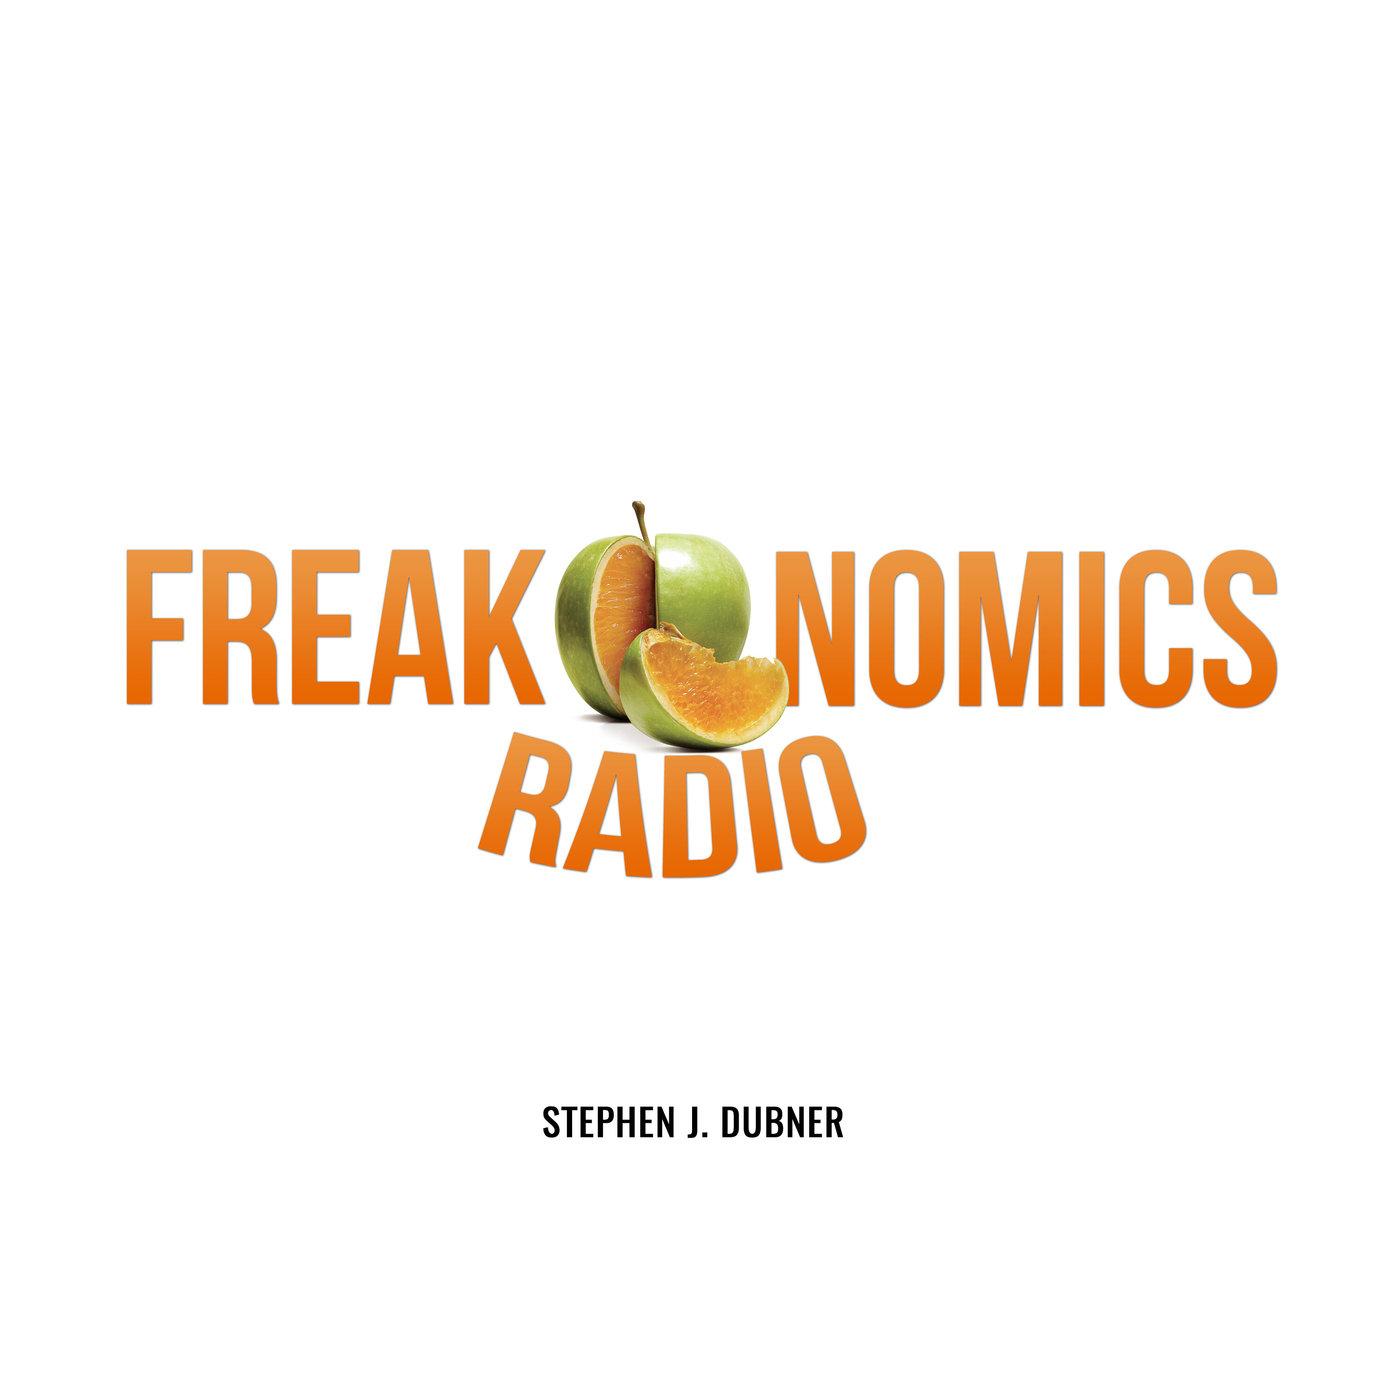 Freakonomics radio podcast